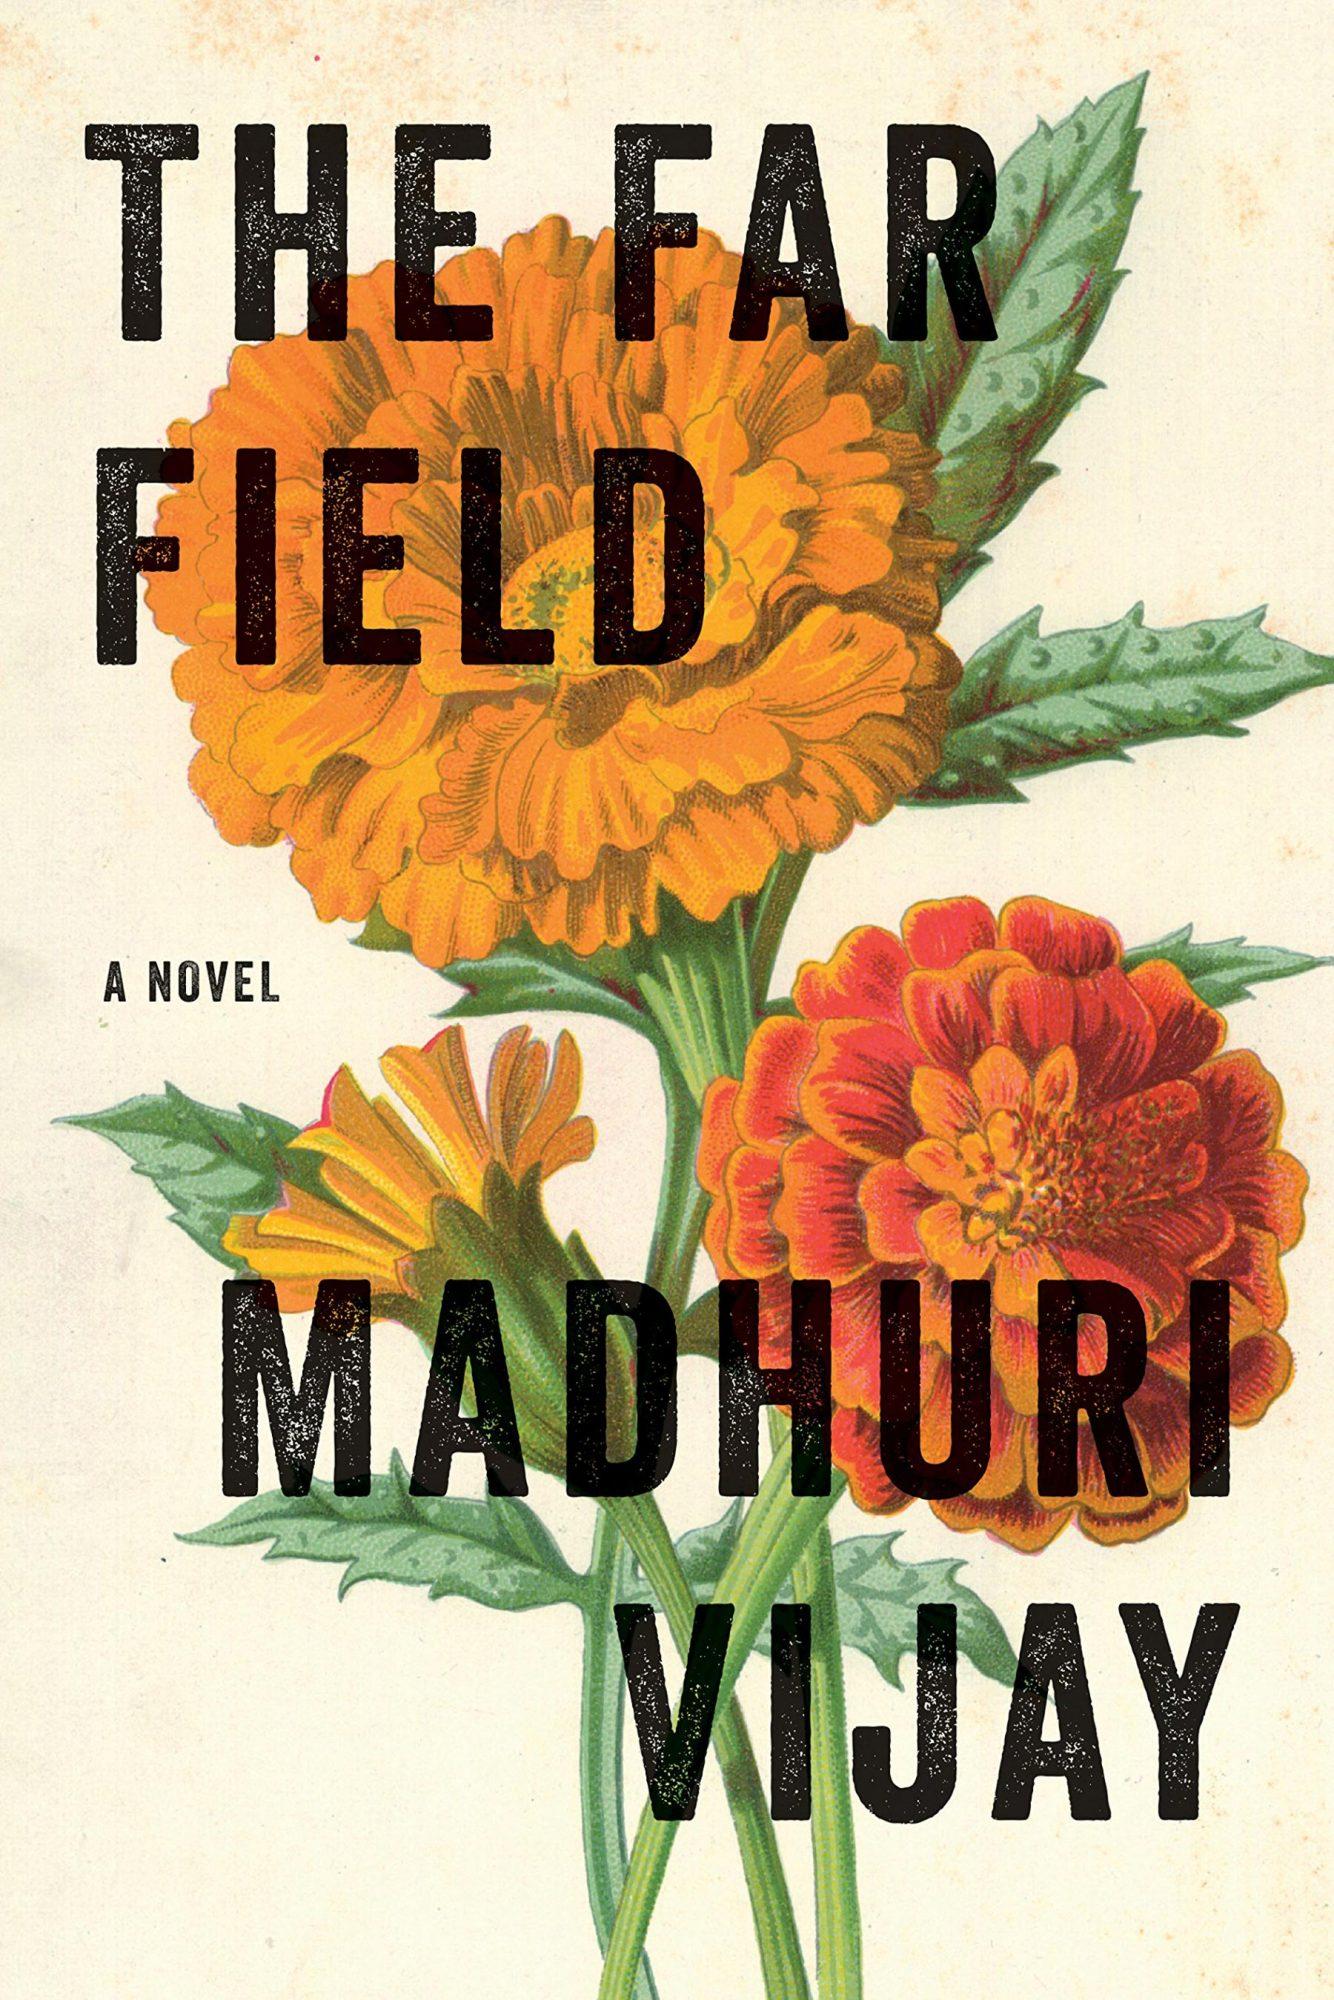 Madhuri Vijay, The Far FieldPublisher: Grove Press